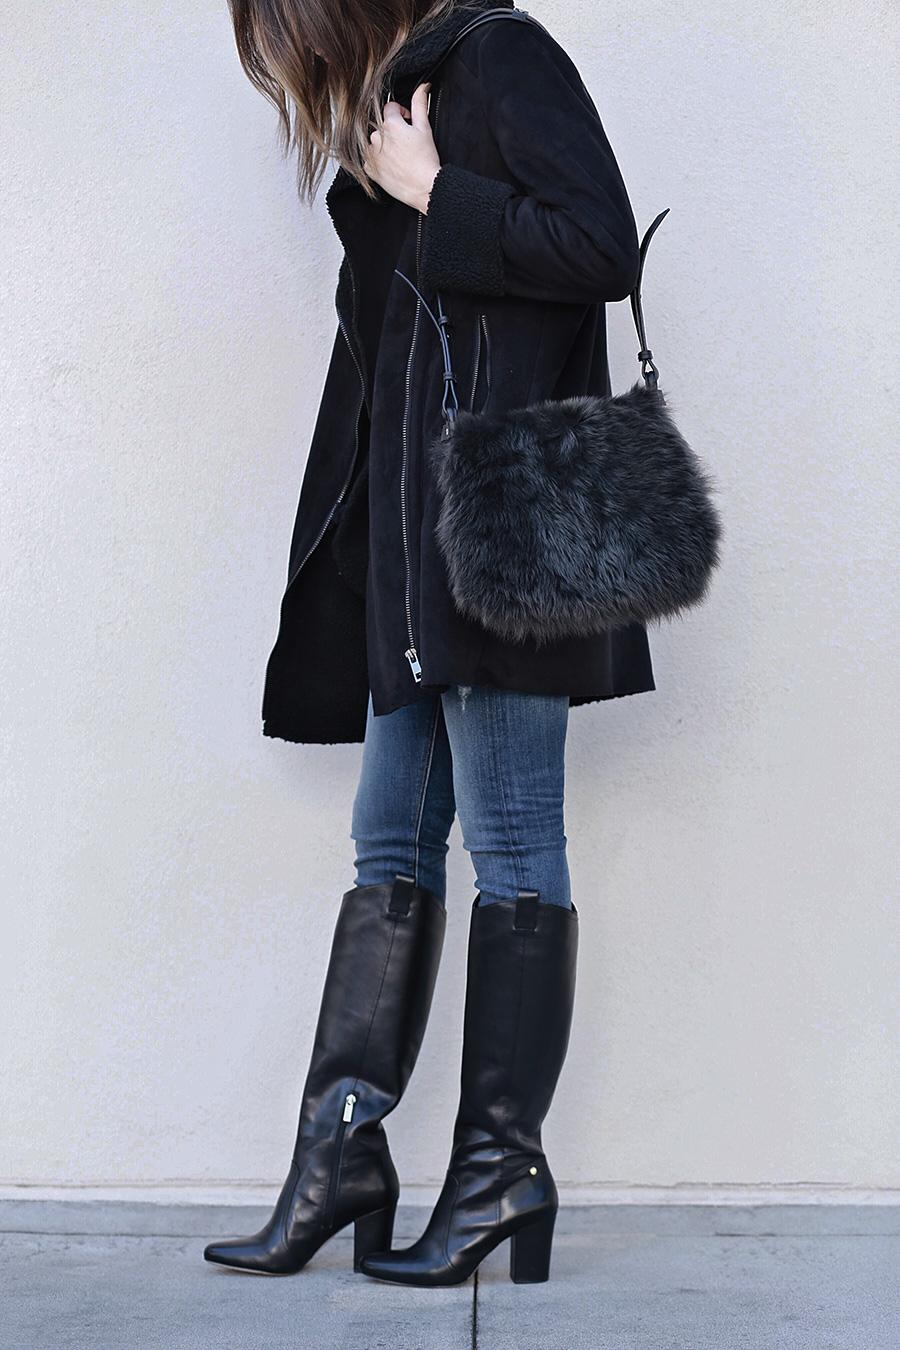 Louise et Cie Boots Fuzzy Handbag | brittanyxavier.com